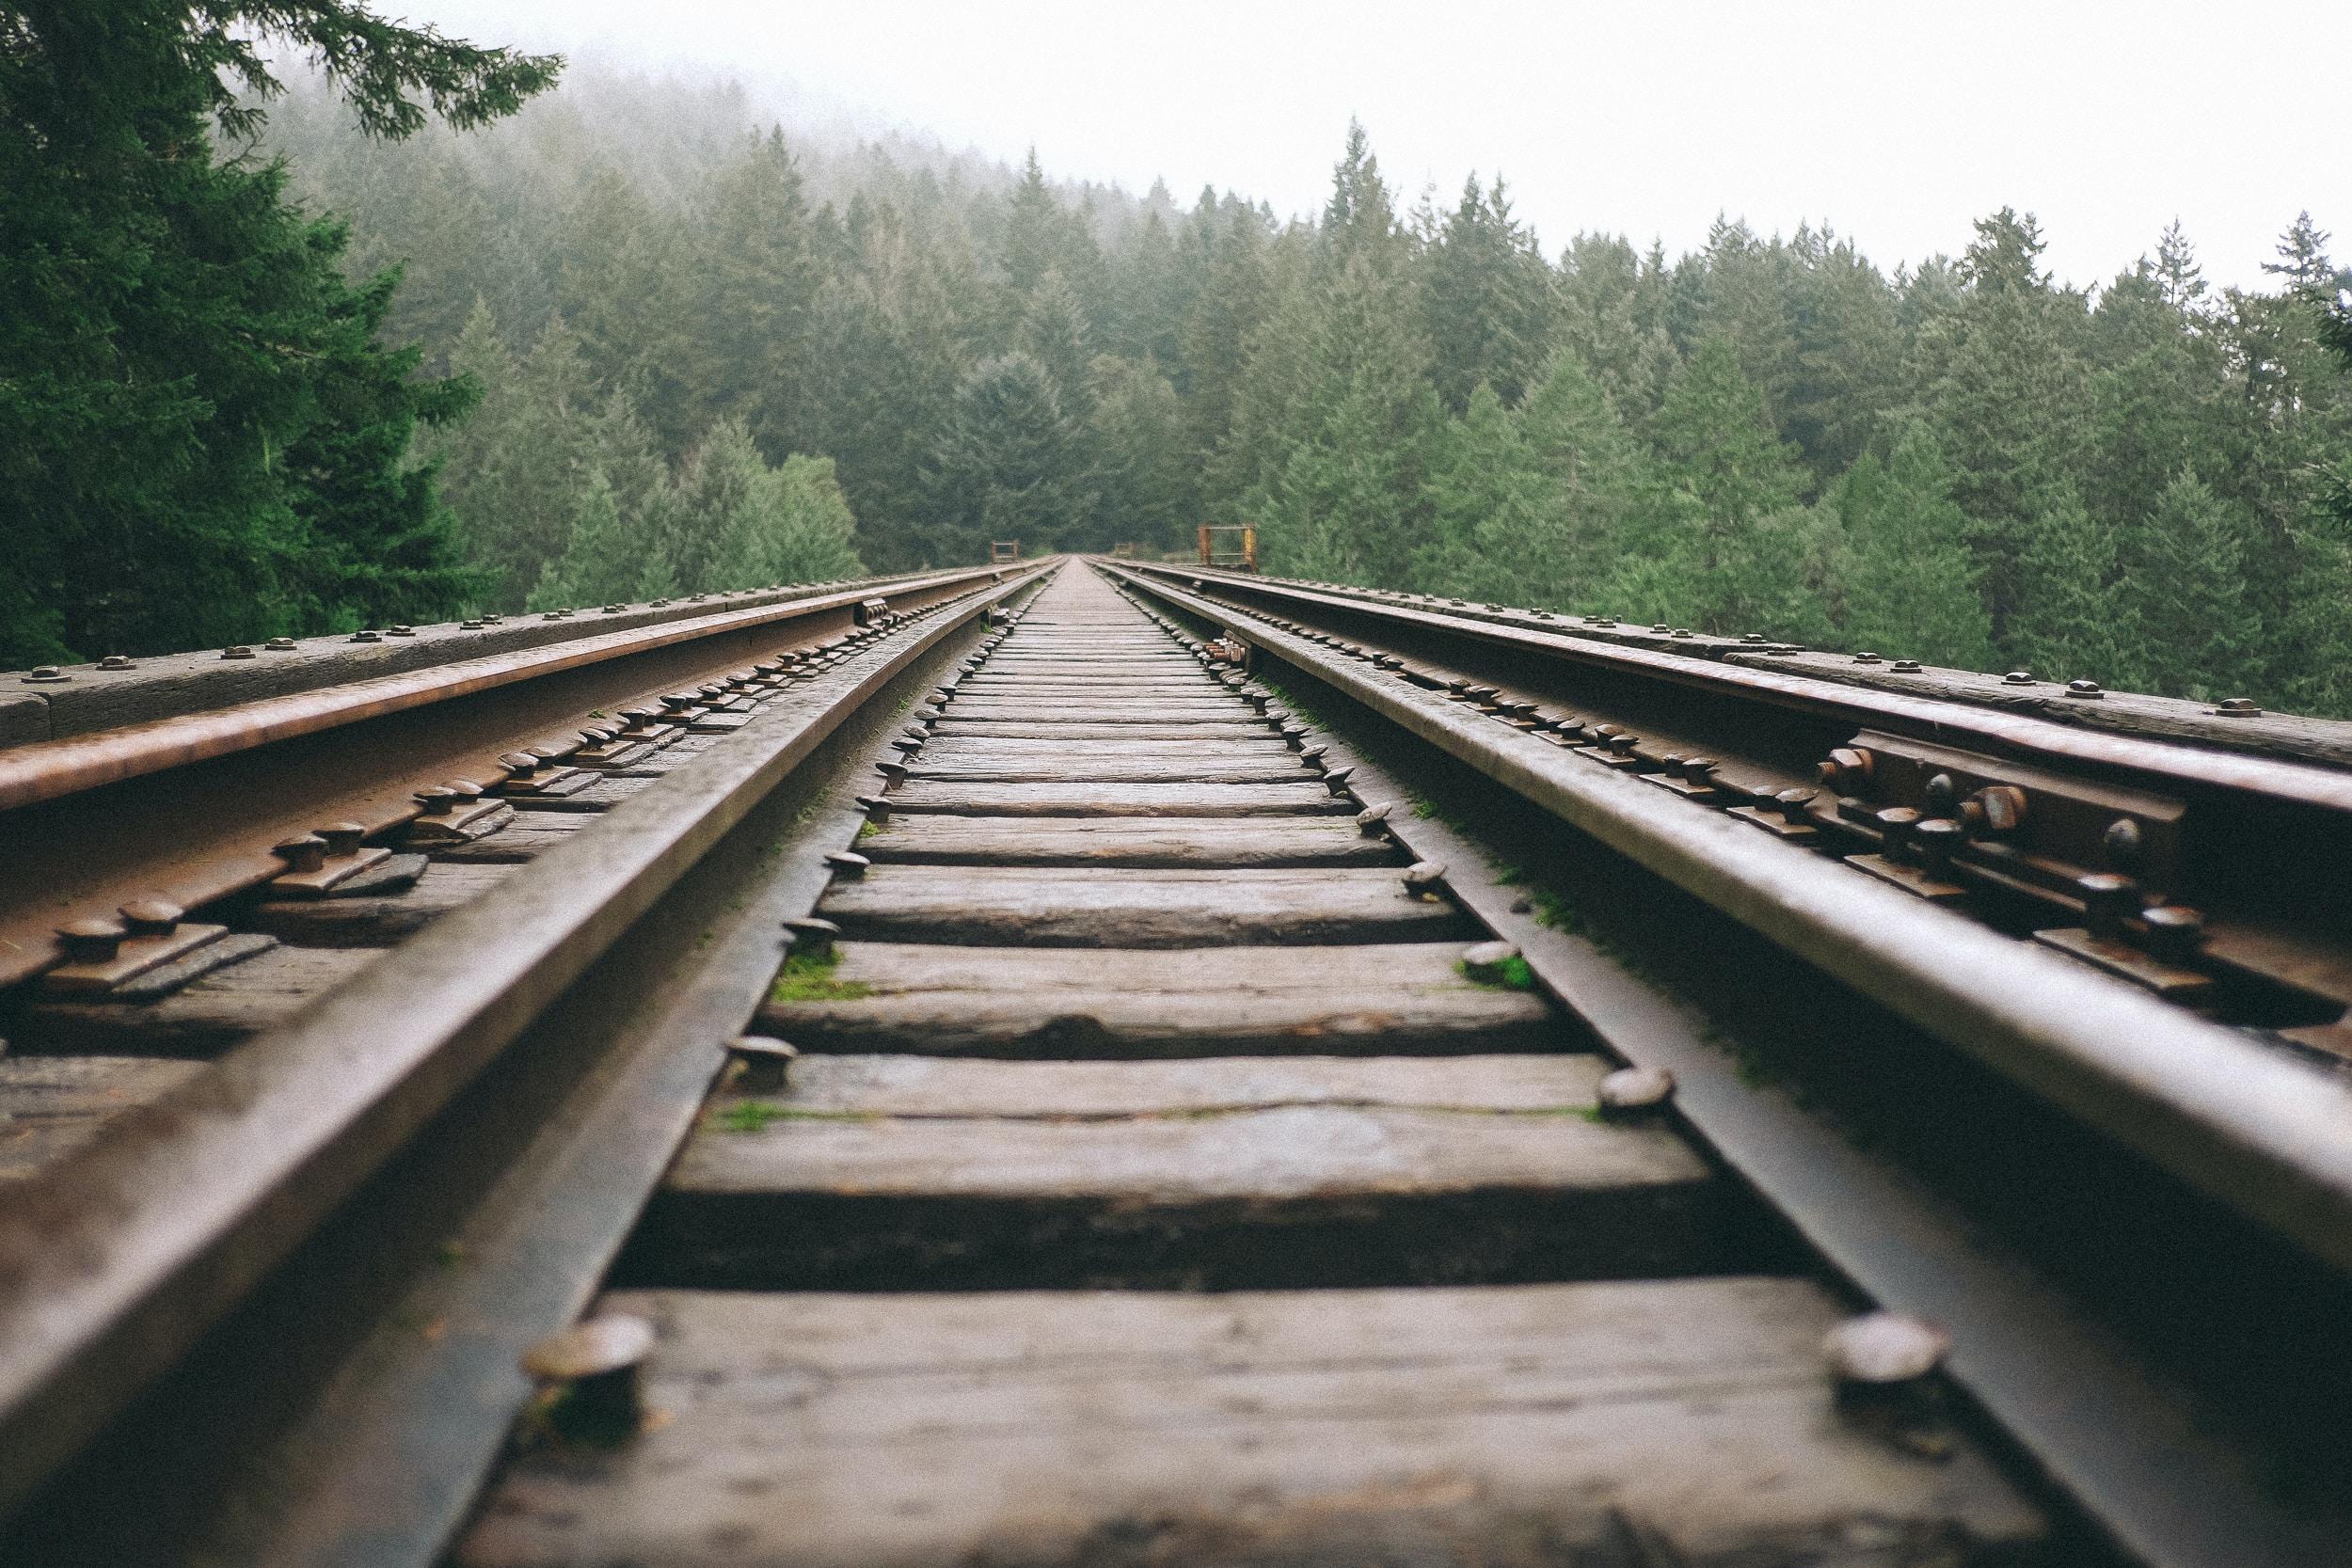 brown and black train rails